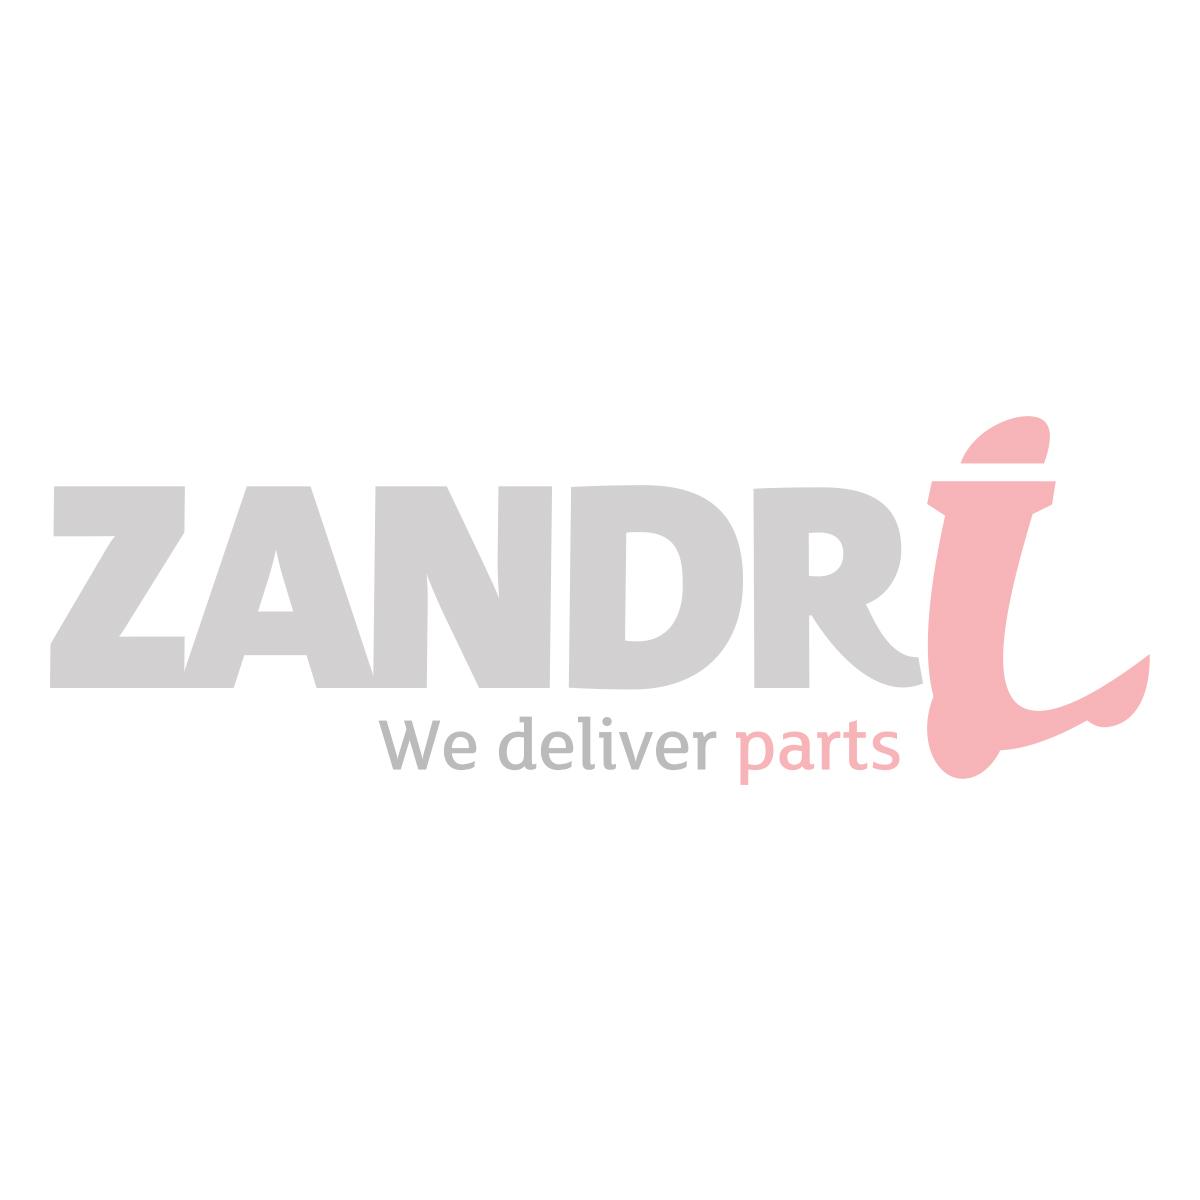 Handvatverwarming DMP scooter / motorscooter B-kwaliteit (^)